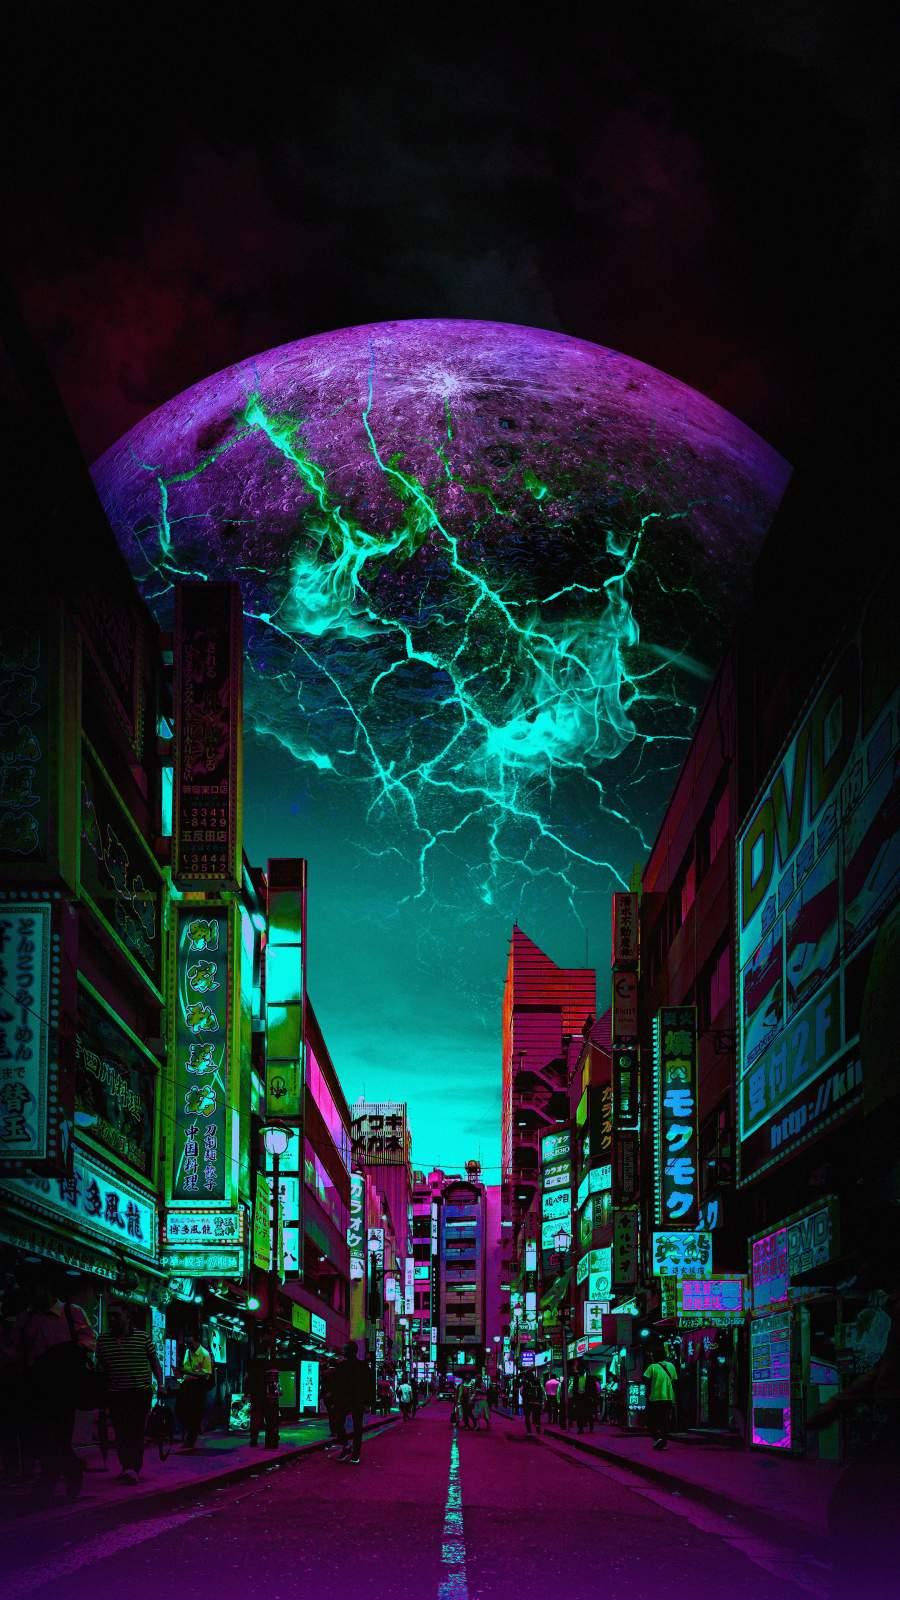 Extraterrestrial City